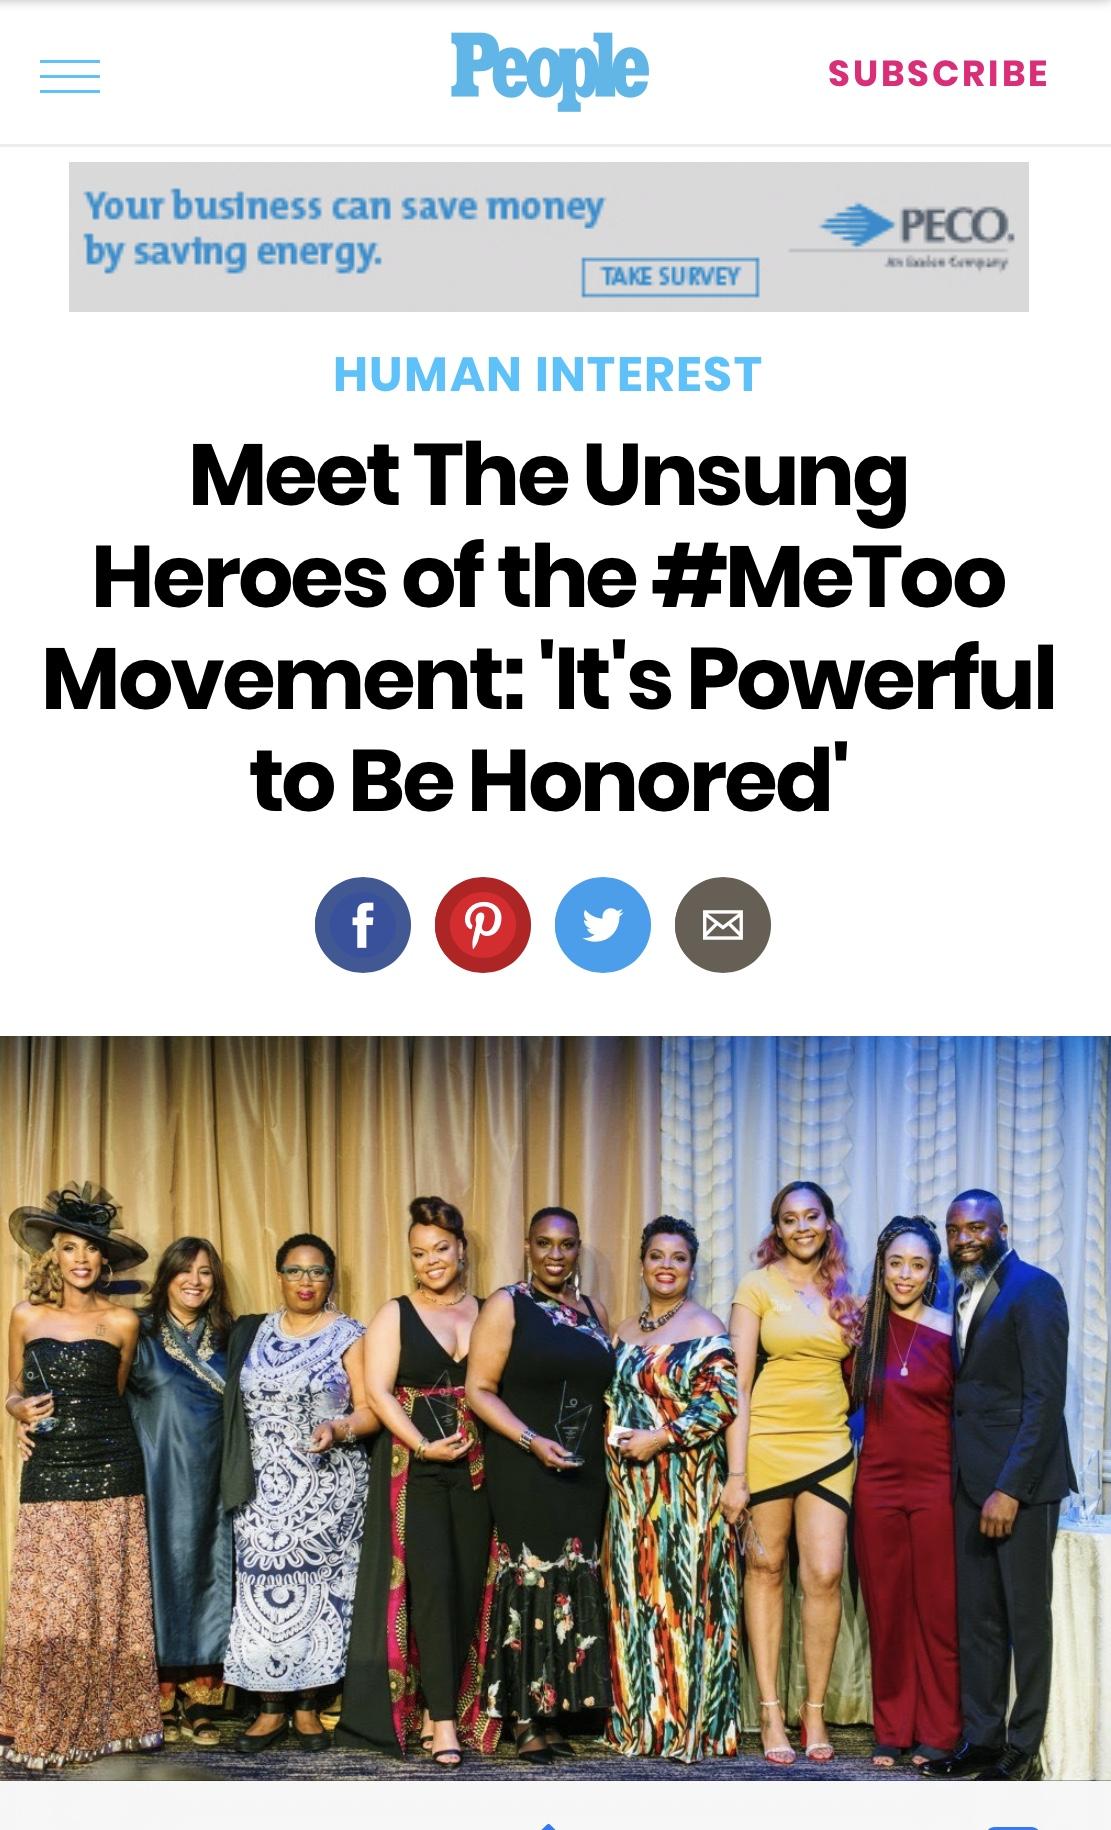 From left: Kenyette Barnes, Sohini Bhattacharya, Aishah Shahidah Simmons, Oronike Odeleye, Kalimah Johnson, Luz Marquez Benbow, Aleesha Barlow, Tynesha McHarris, and Darnell Moore